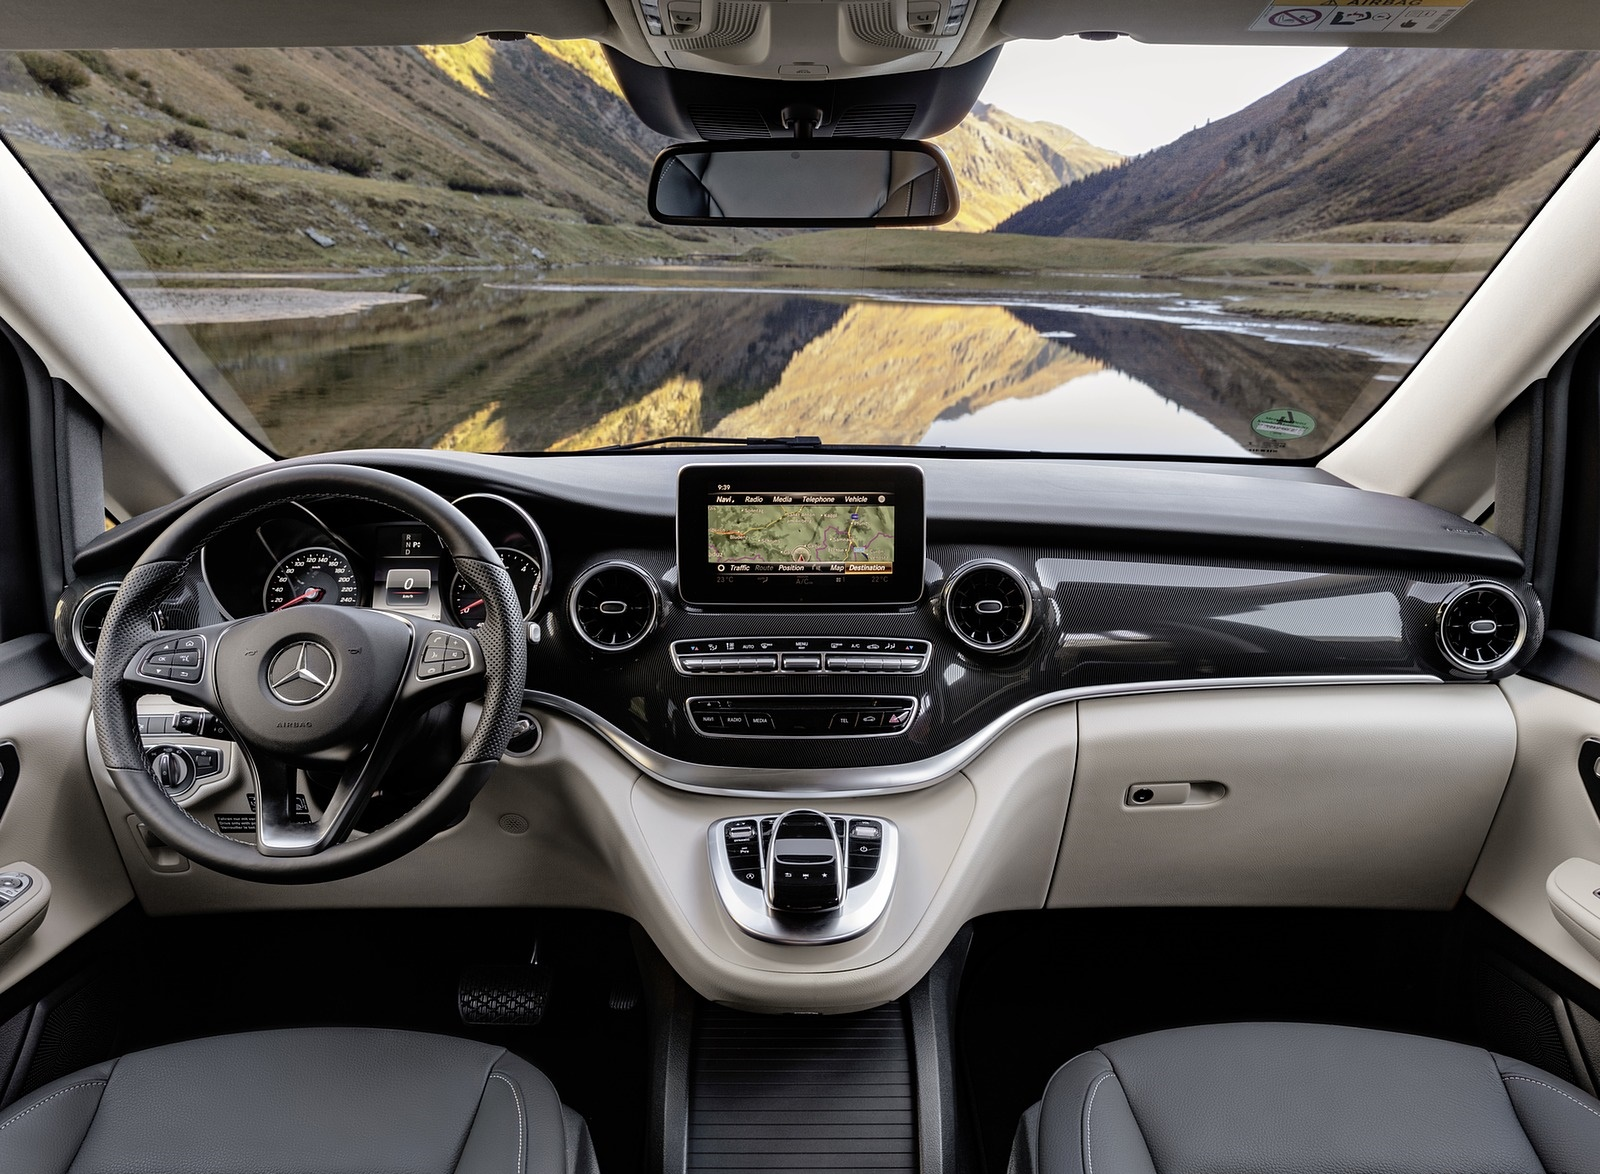 2019 Mercedes Benz V Class Marco Polo Interior Cockpit Wallpapers